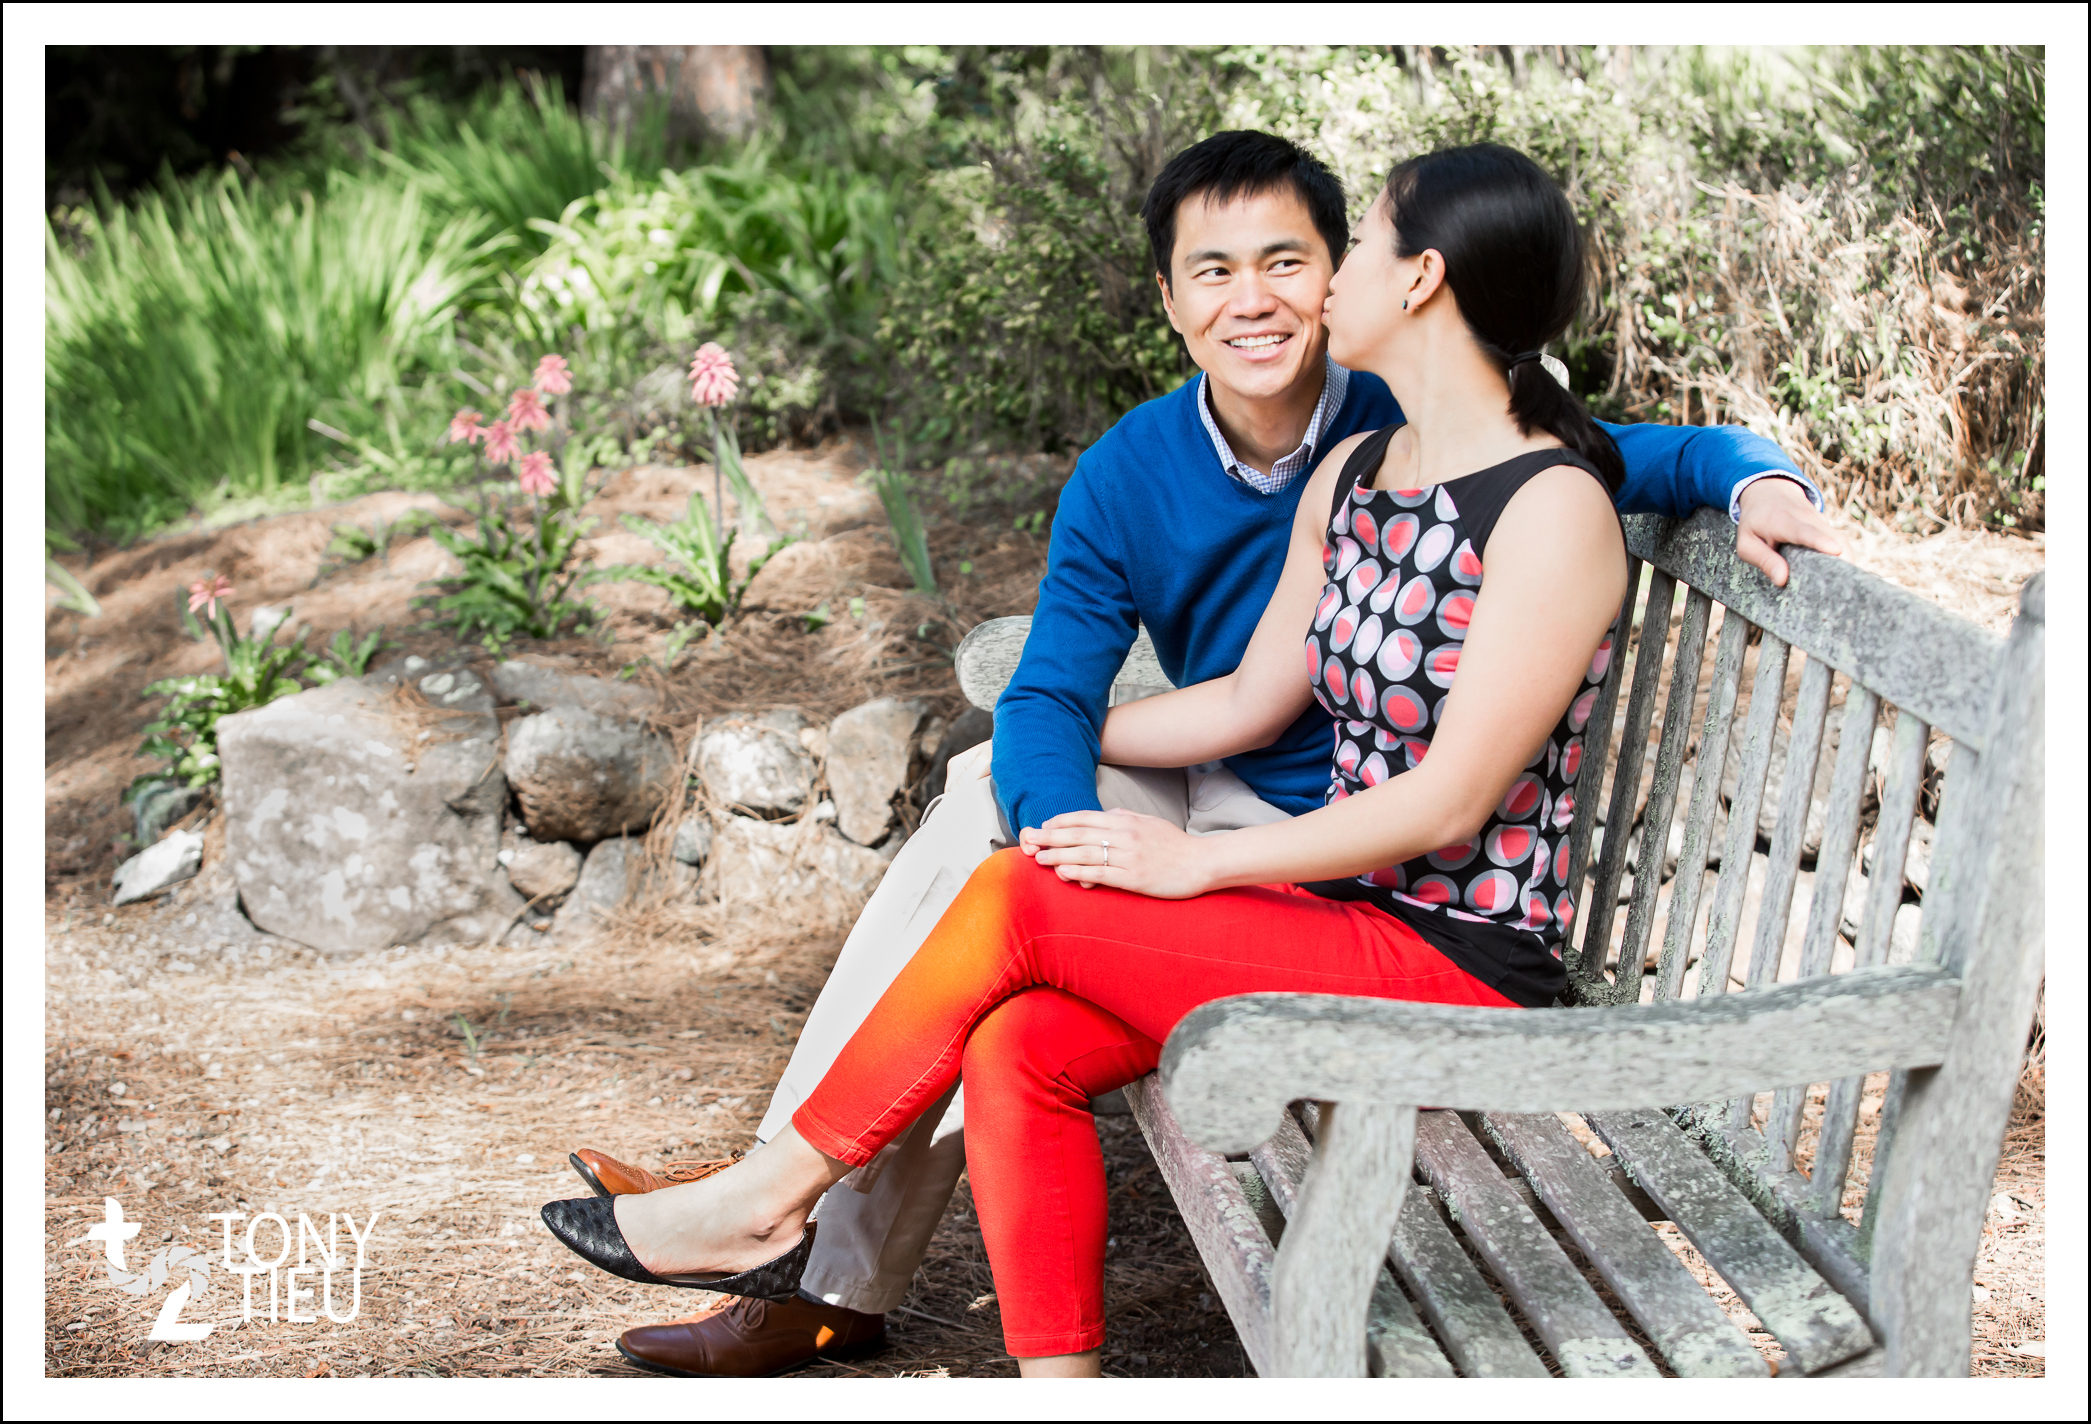 Tony_Tieu_Yang Jimmy_Engagement_11